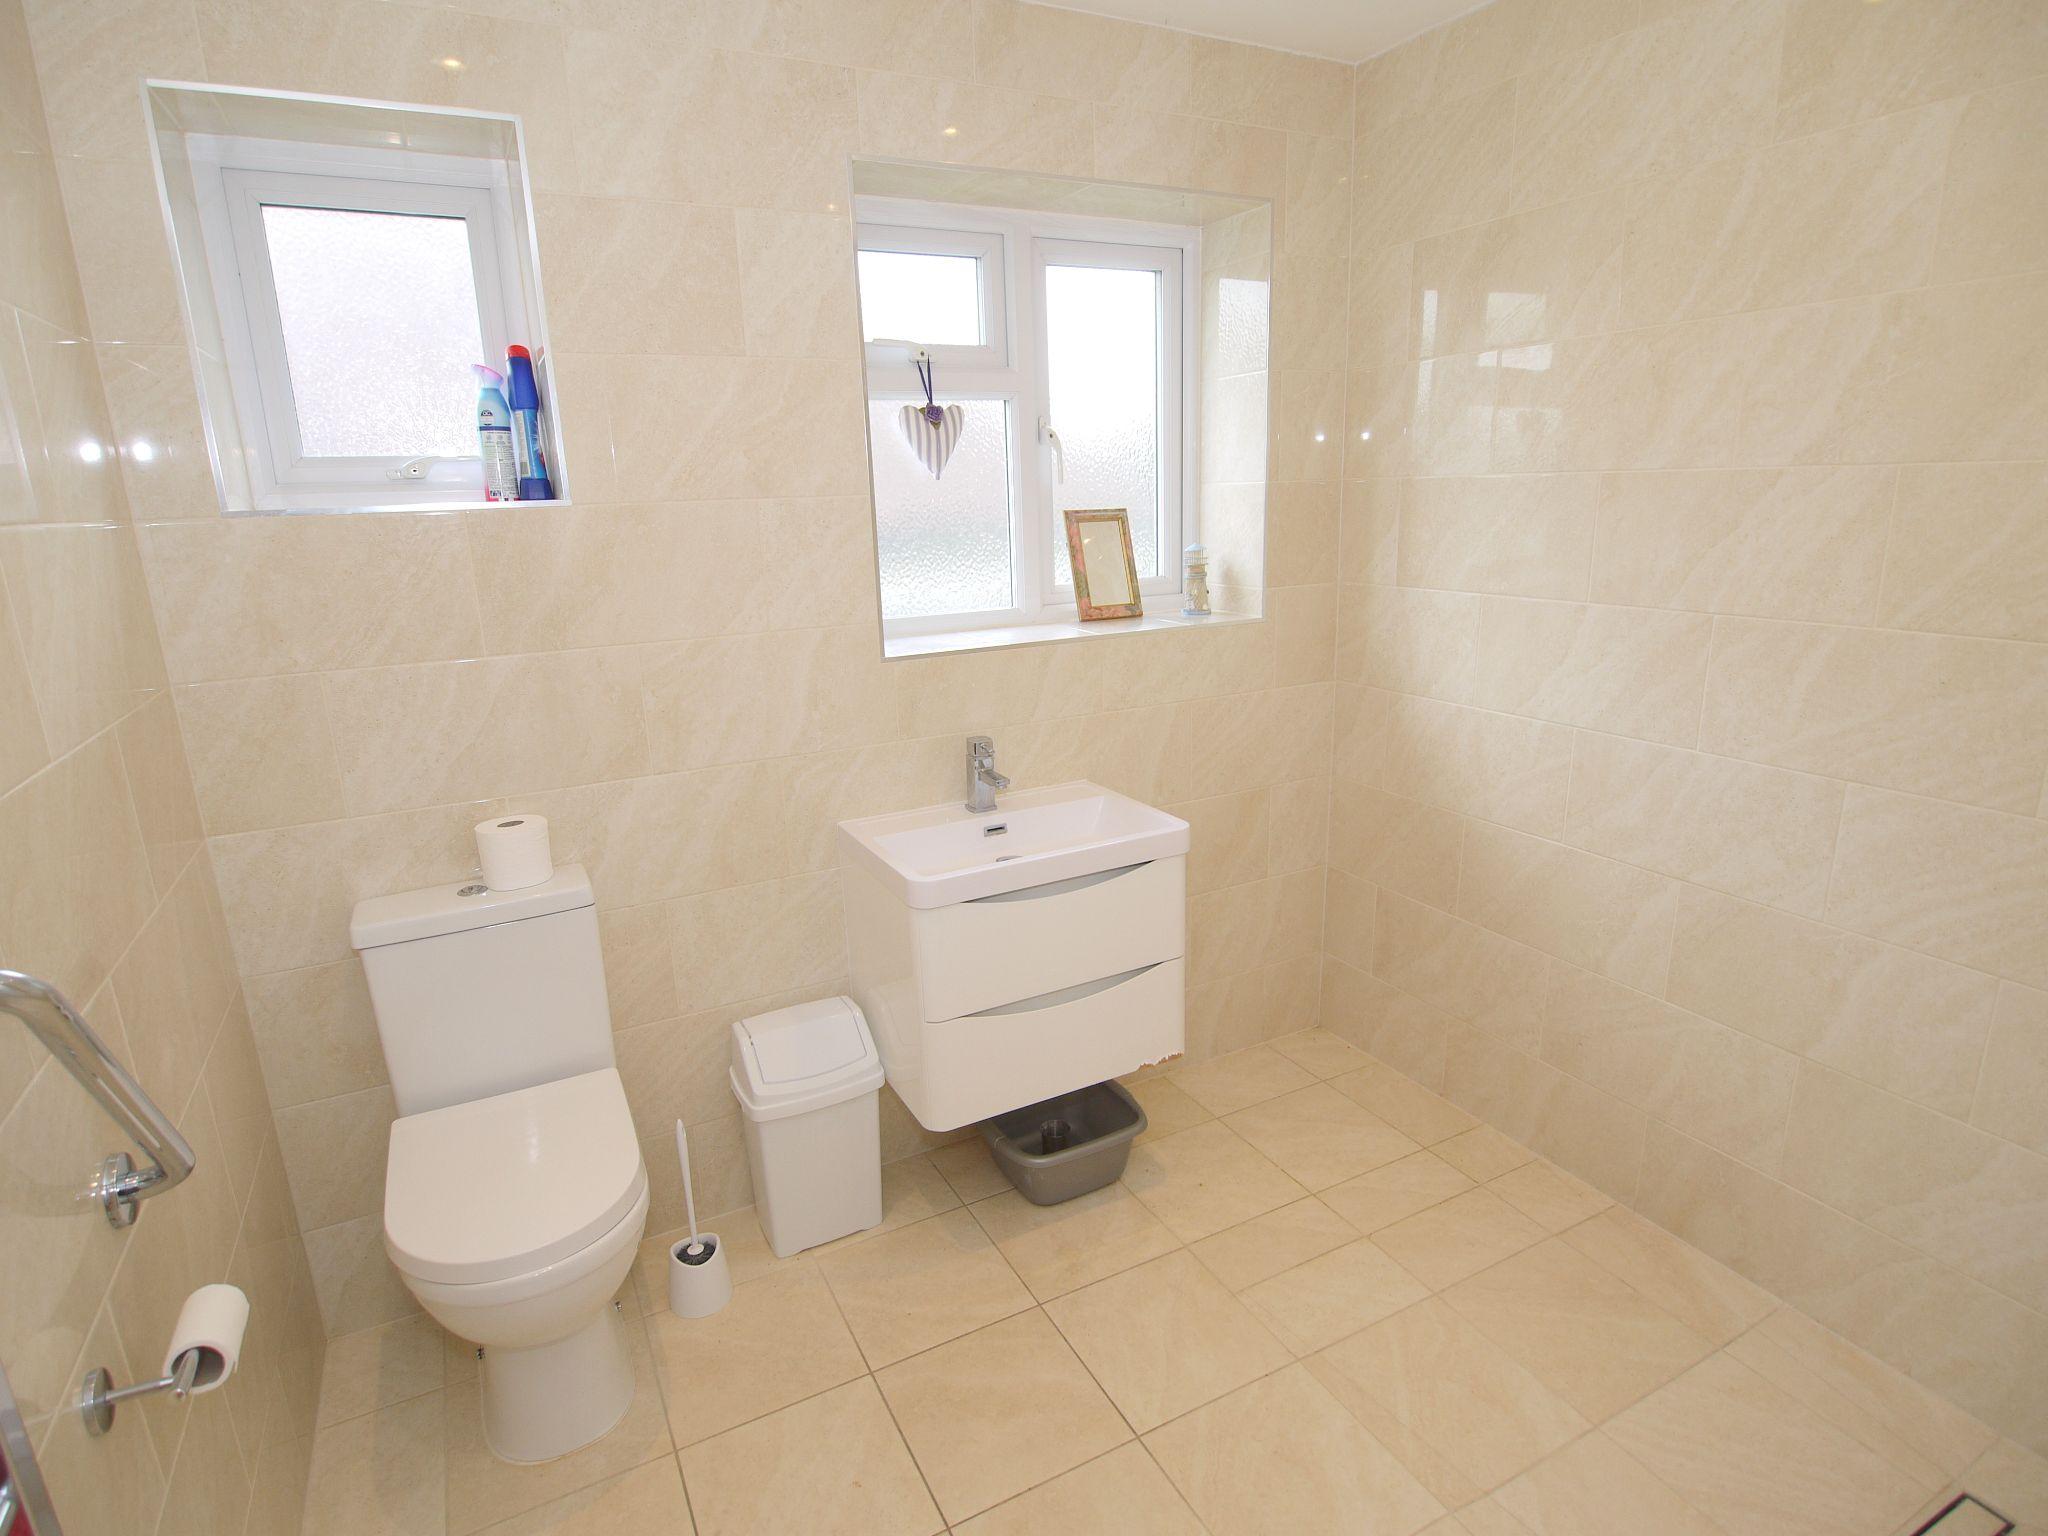 2 bedroom detached bungalow Sold in Sevenoaks - Photograph 8